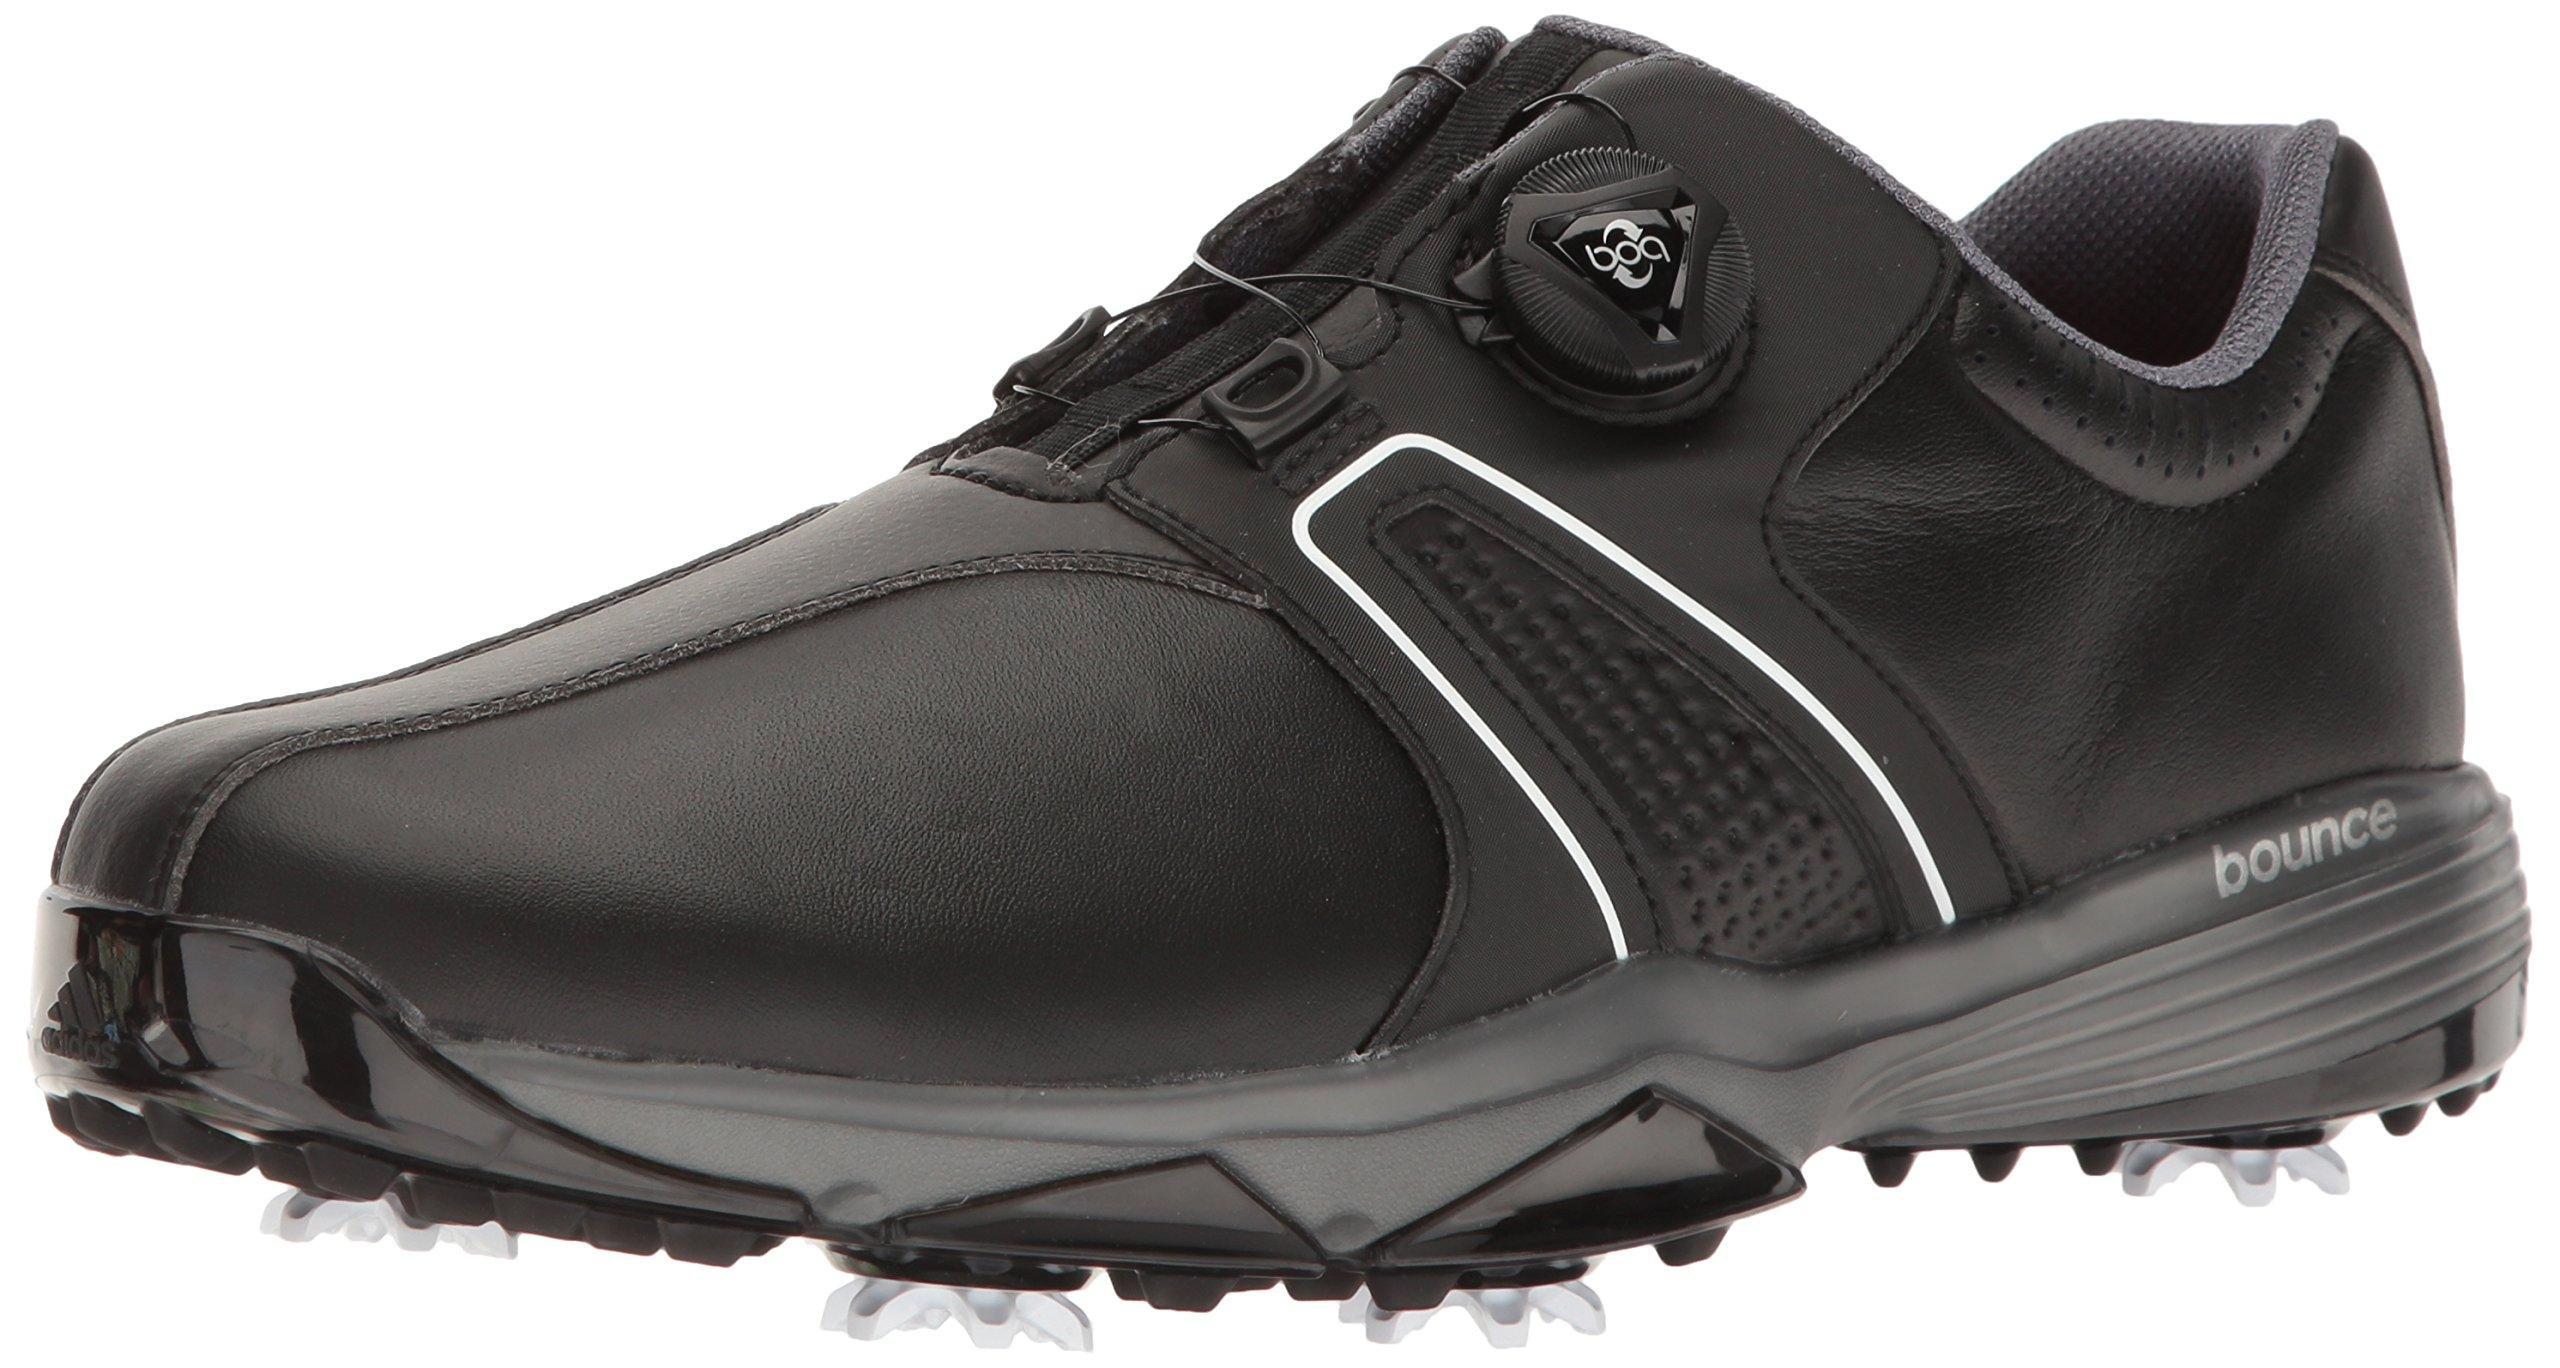 adidas Men's 360 Traxion BOA Golf Shoe, CORE Black/Footwear White/Dark Silver Metallic, 10.5 M US